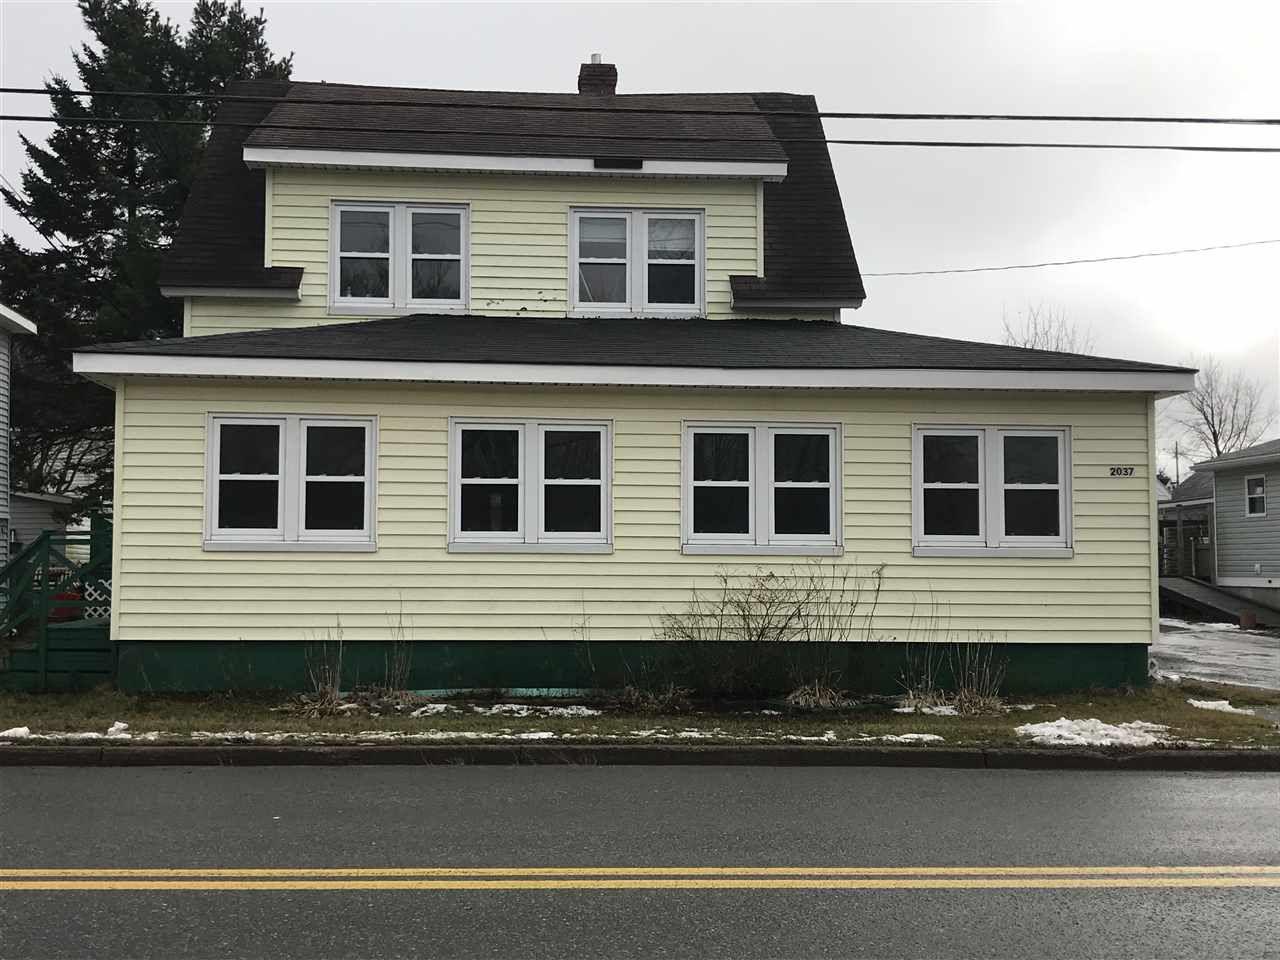 Main Photo: 2037 Church Street in Westville: 107-Trenton,Westville,Pictou Residential for sale (Northern Region)  : MLS®# 201828759